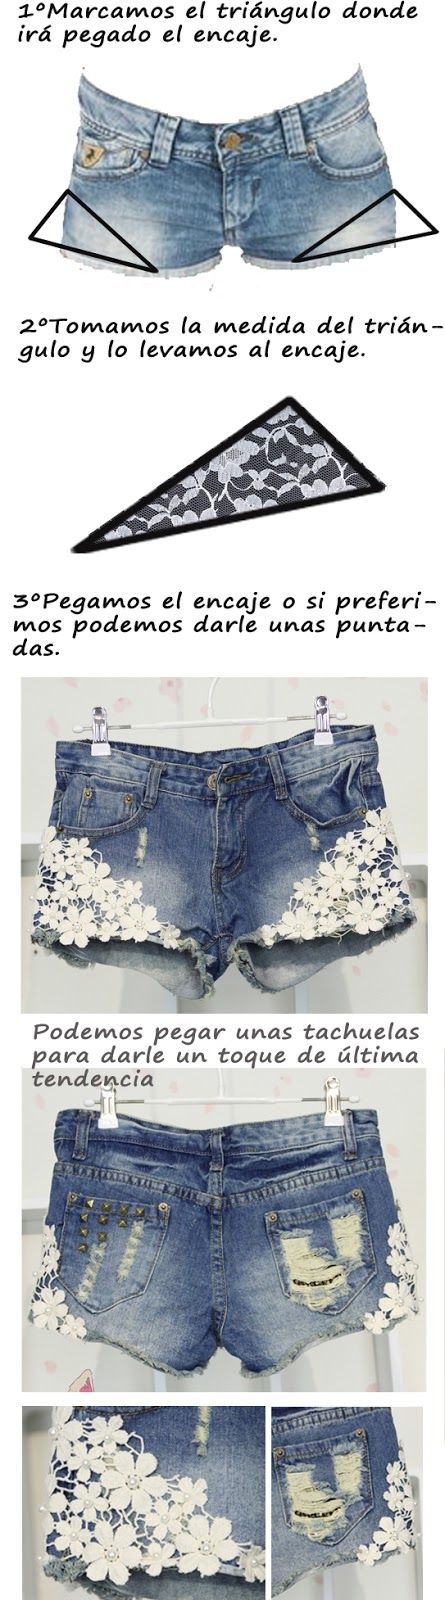 DIY shorts con encaje   BestLookzone